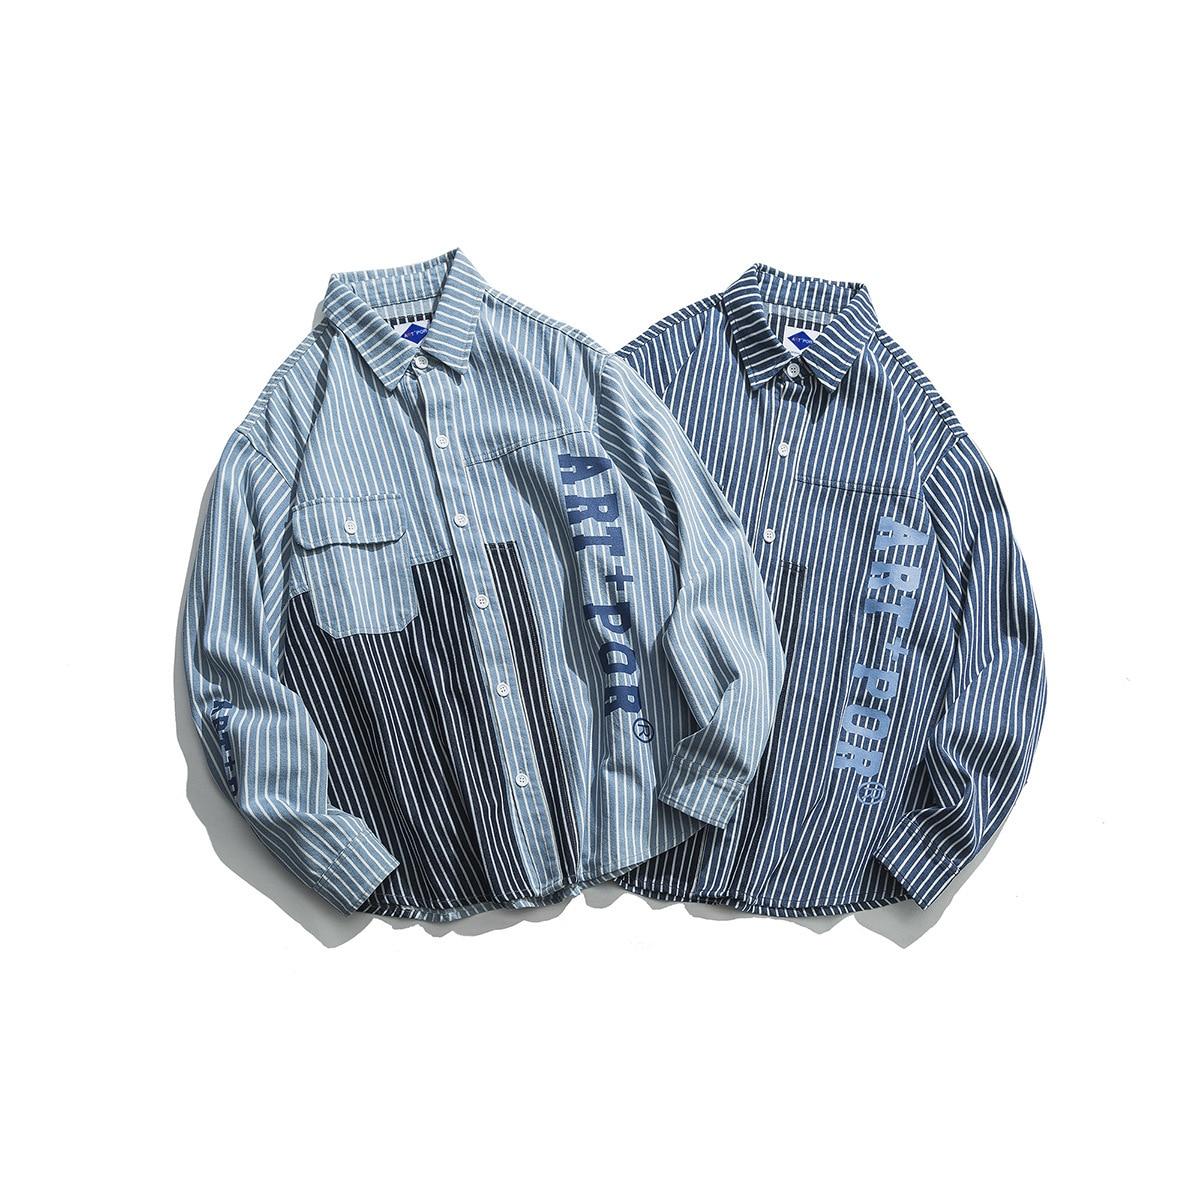 0902 Spring Striped Denim Shirt Men Loose Long Sleeve Vintage Loose Japanese Streetwear Spliced Color Hip Hop Shirt Men Fashion in Casual Shirts from Men 39 s Clothing